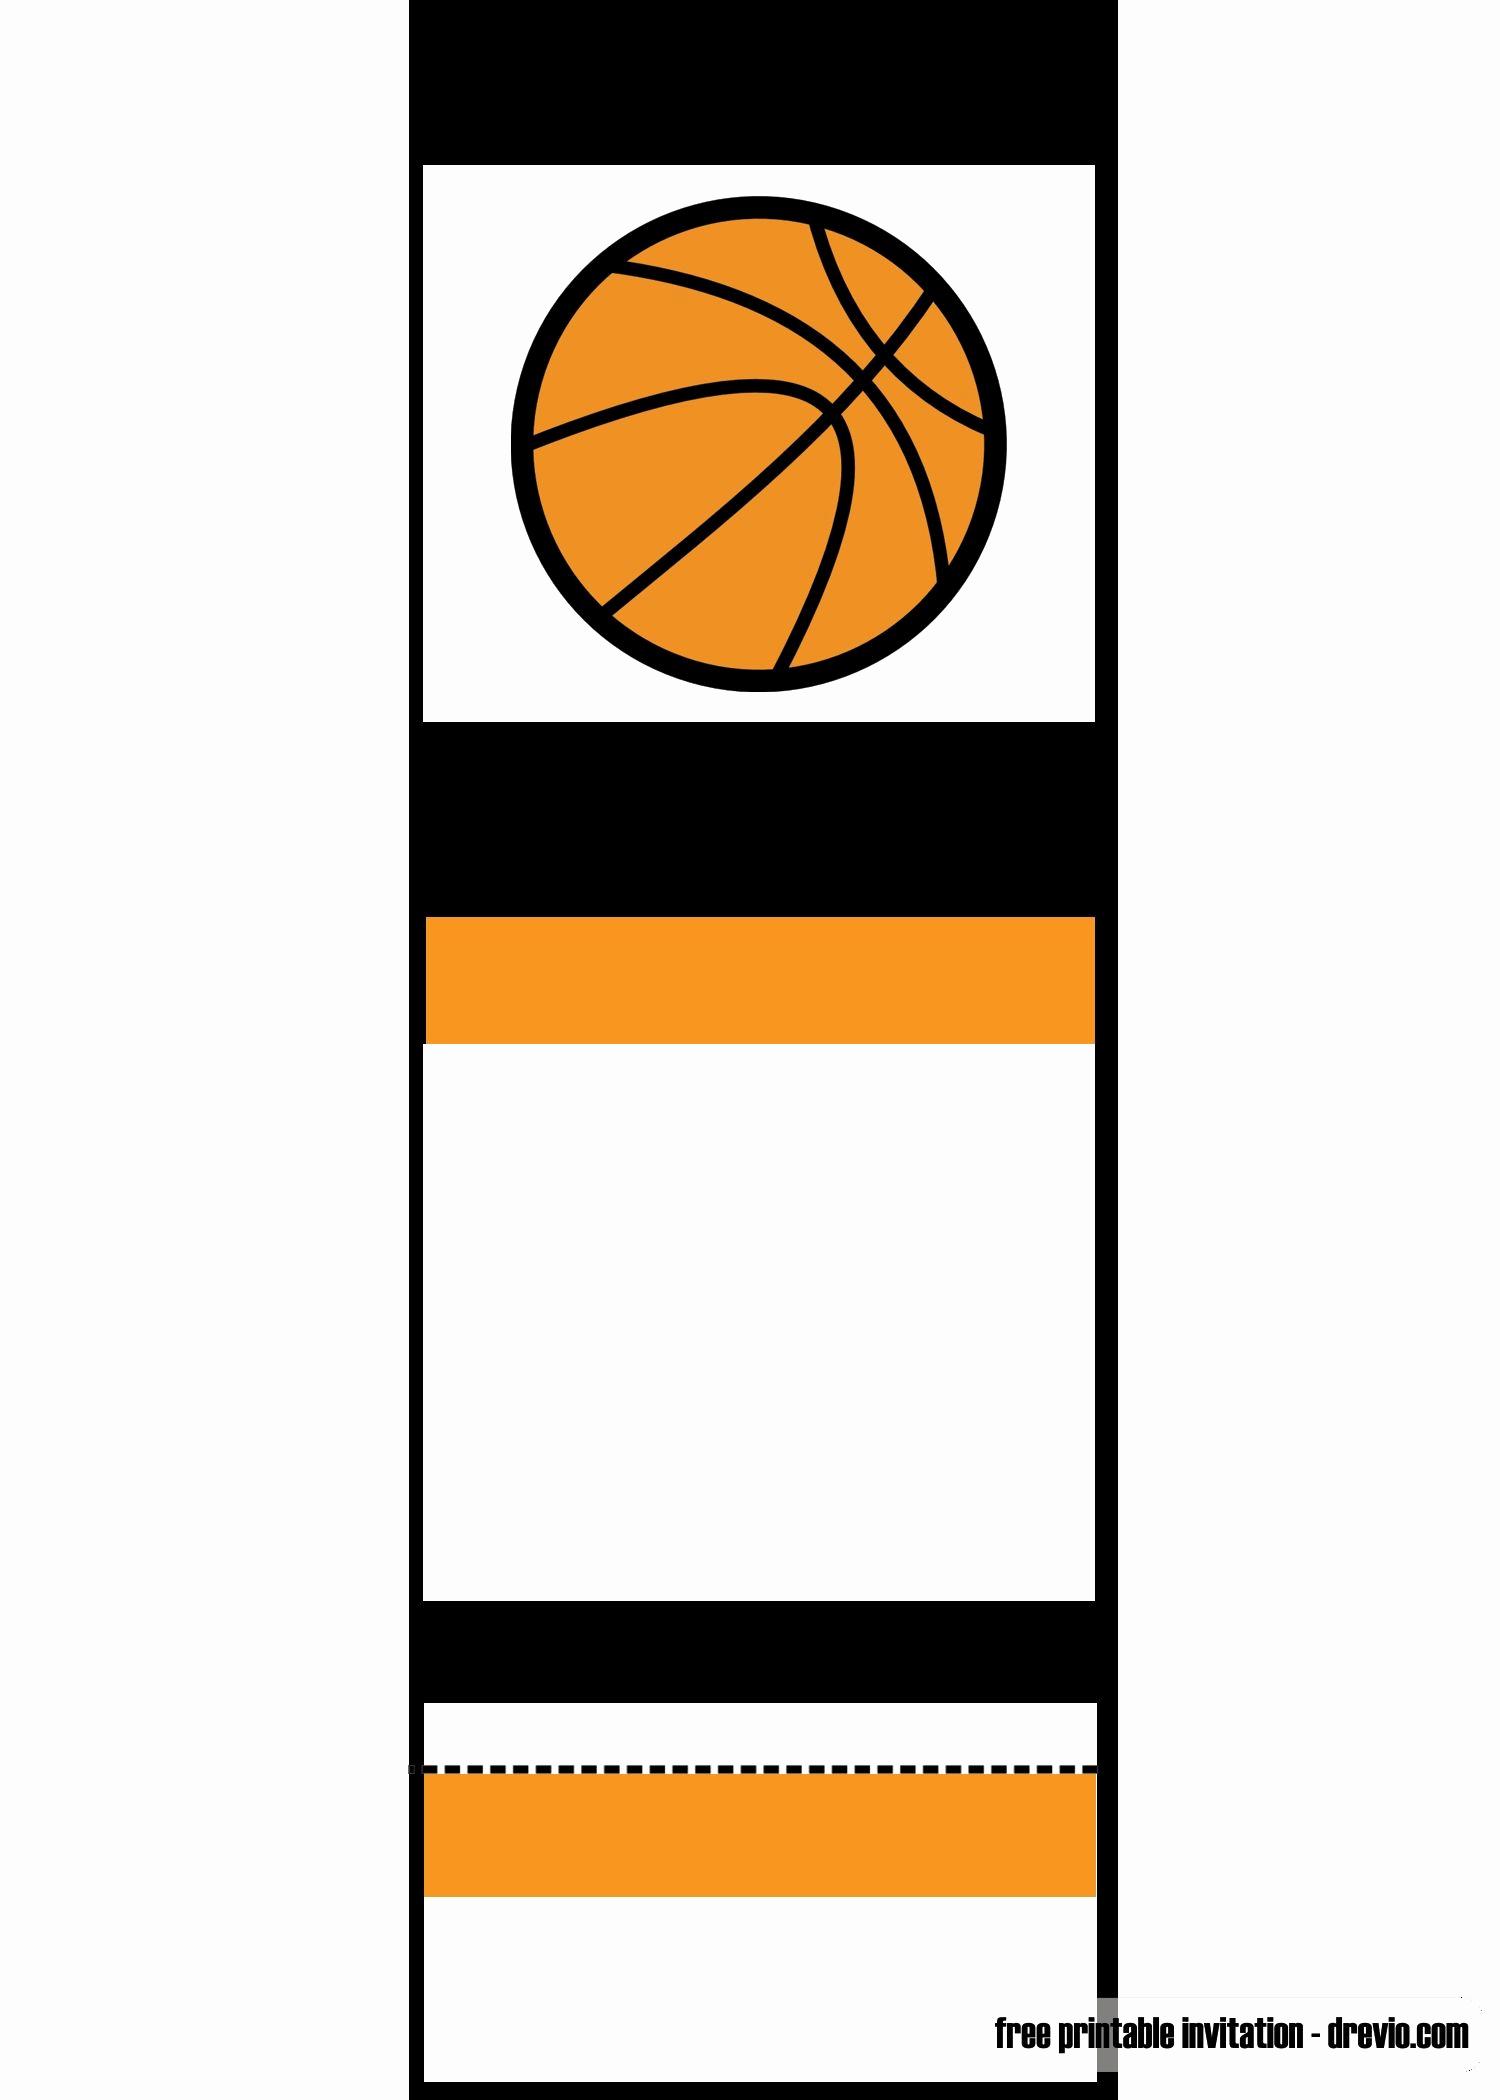 Basketball Ticket Invitation Template Fresh Free Printable Basketball Ticket Invitation